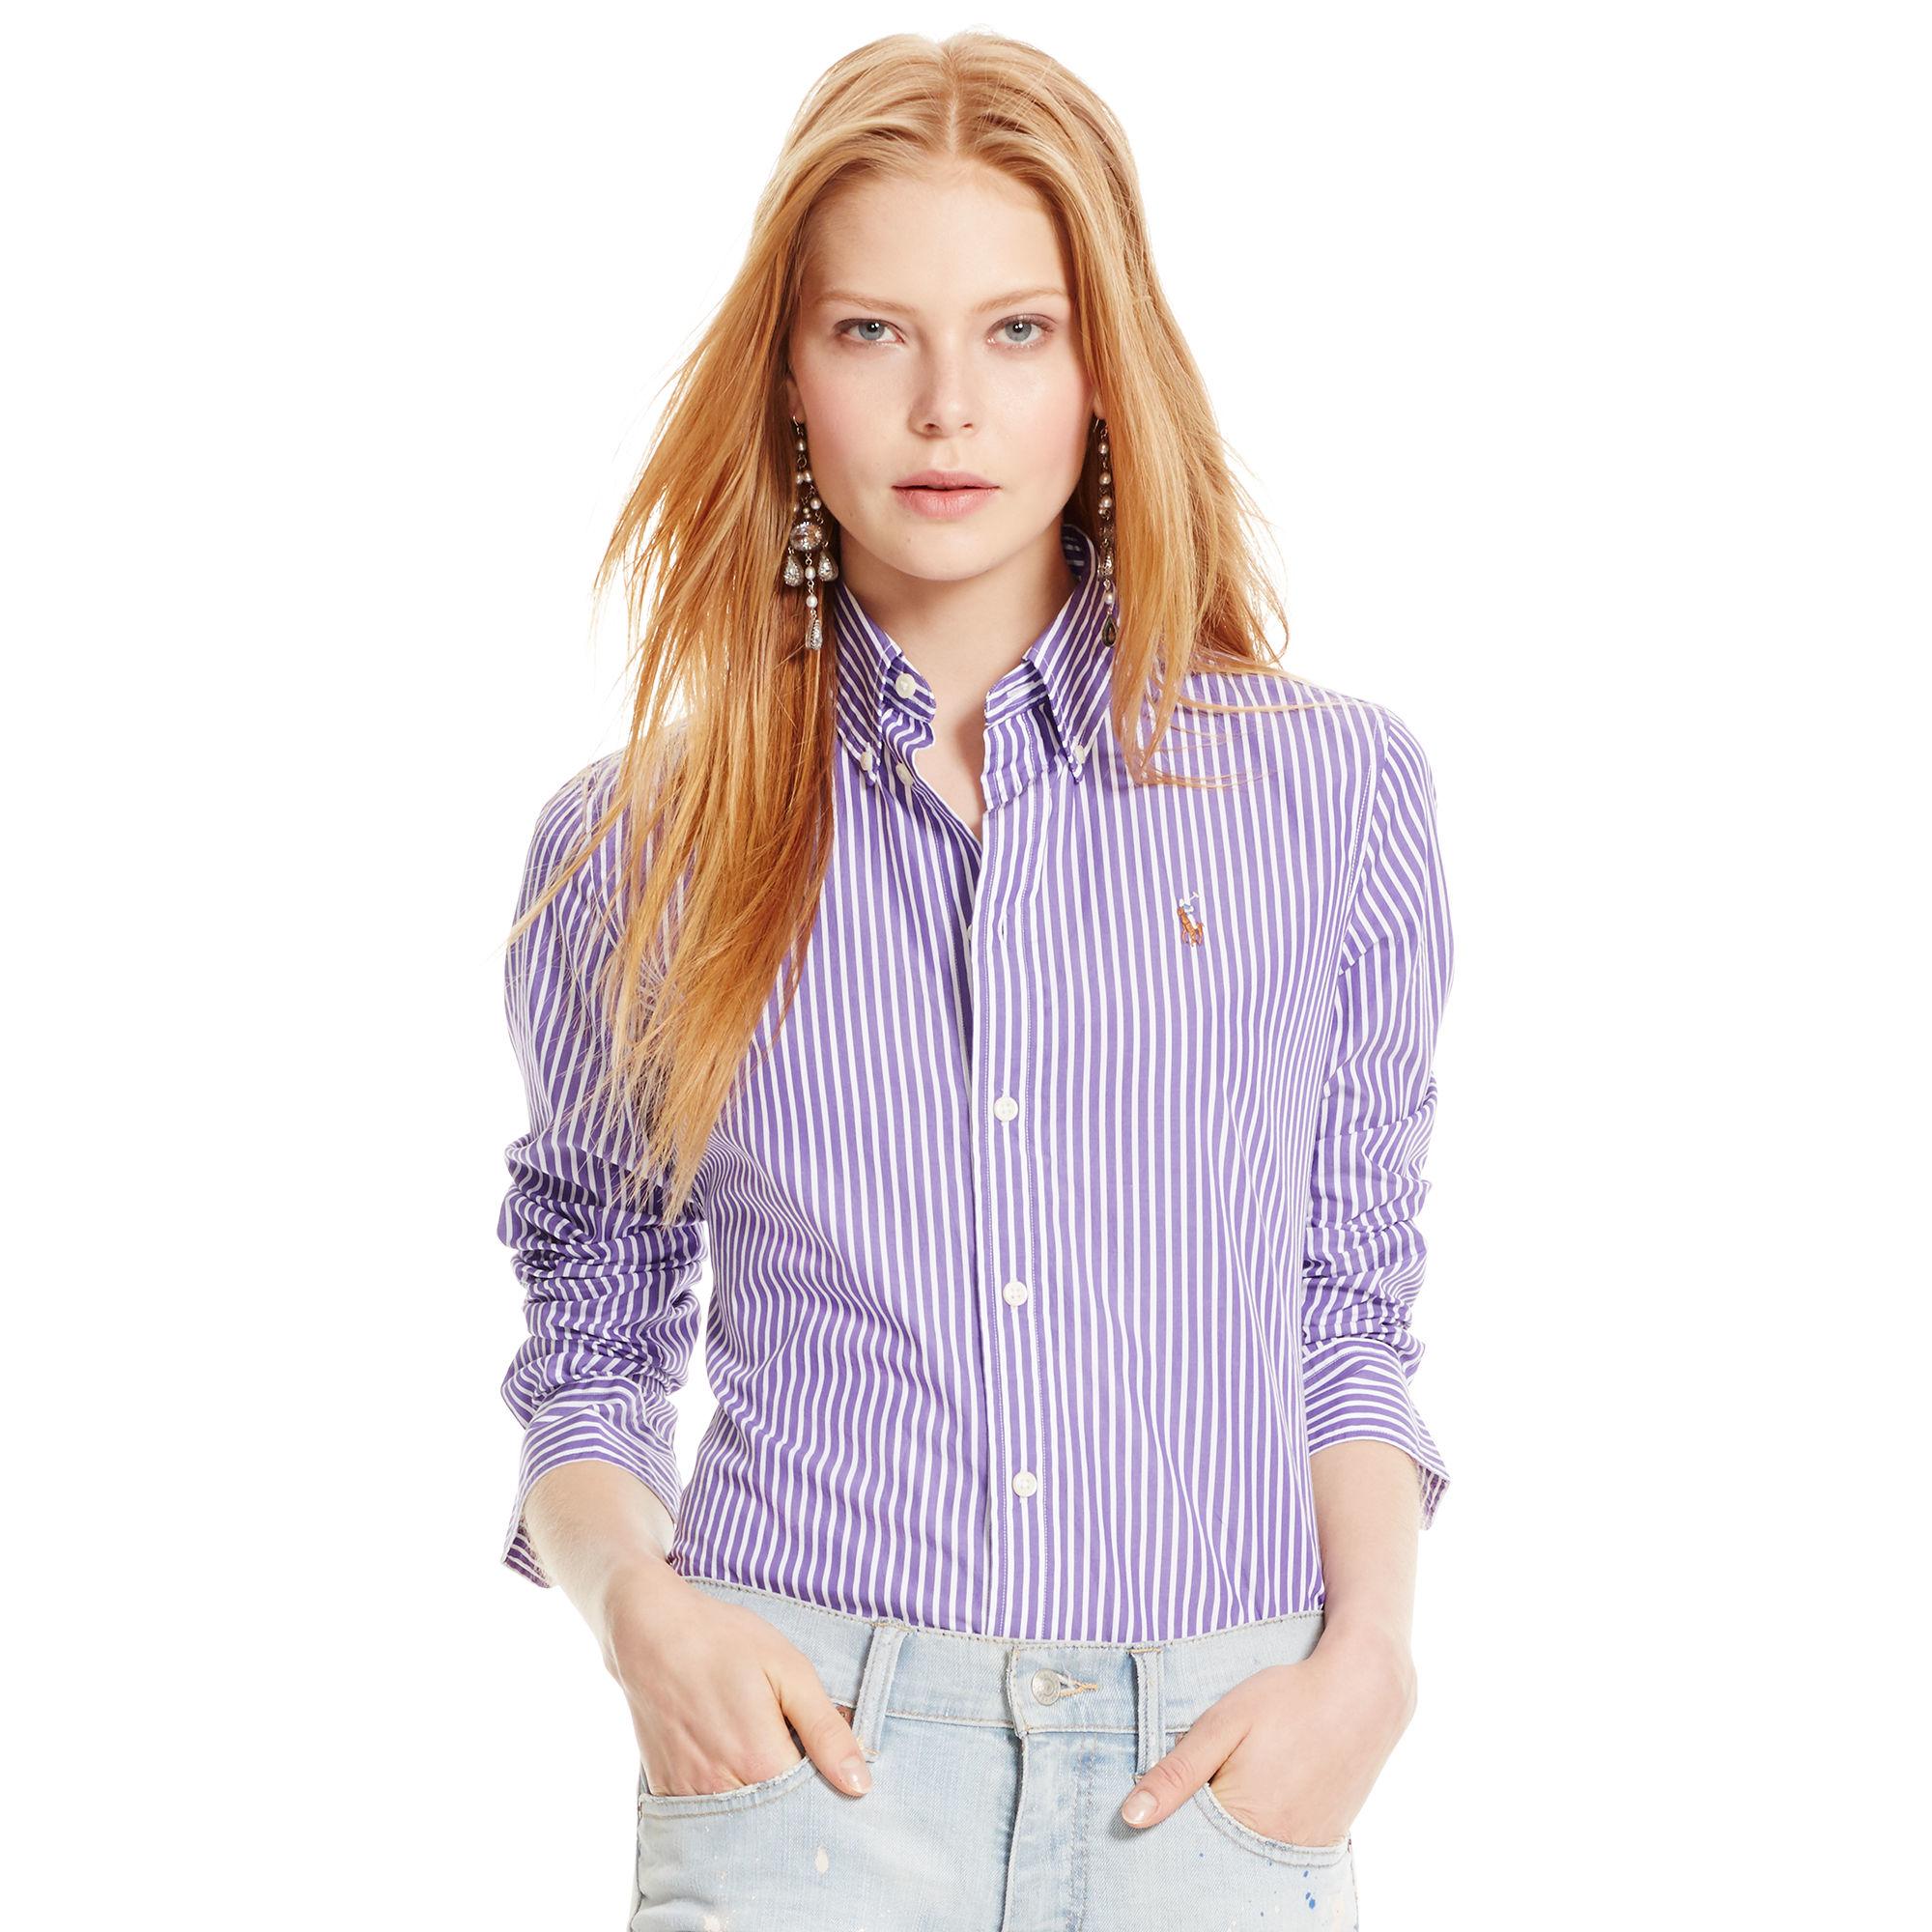 39affa25c941 Polo Ralph Lauren Custom-fit Striped Shirt in Purple - Lyst